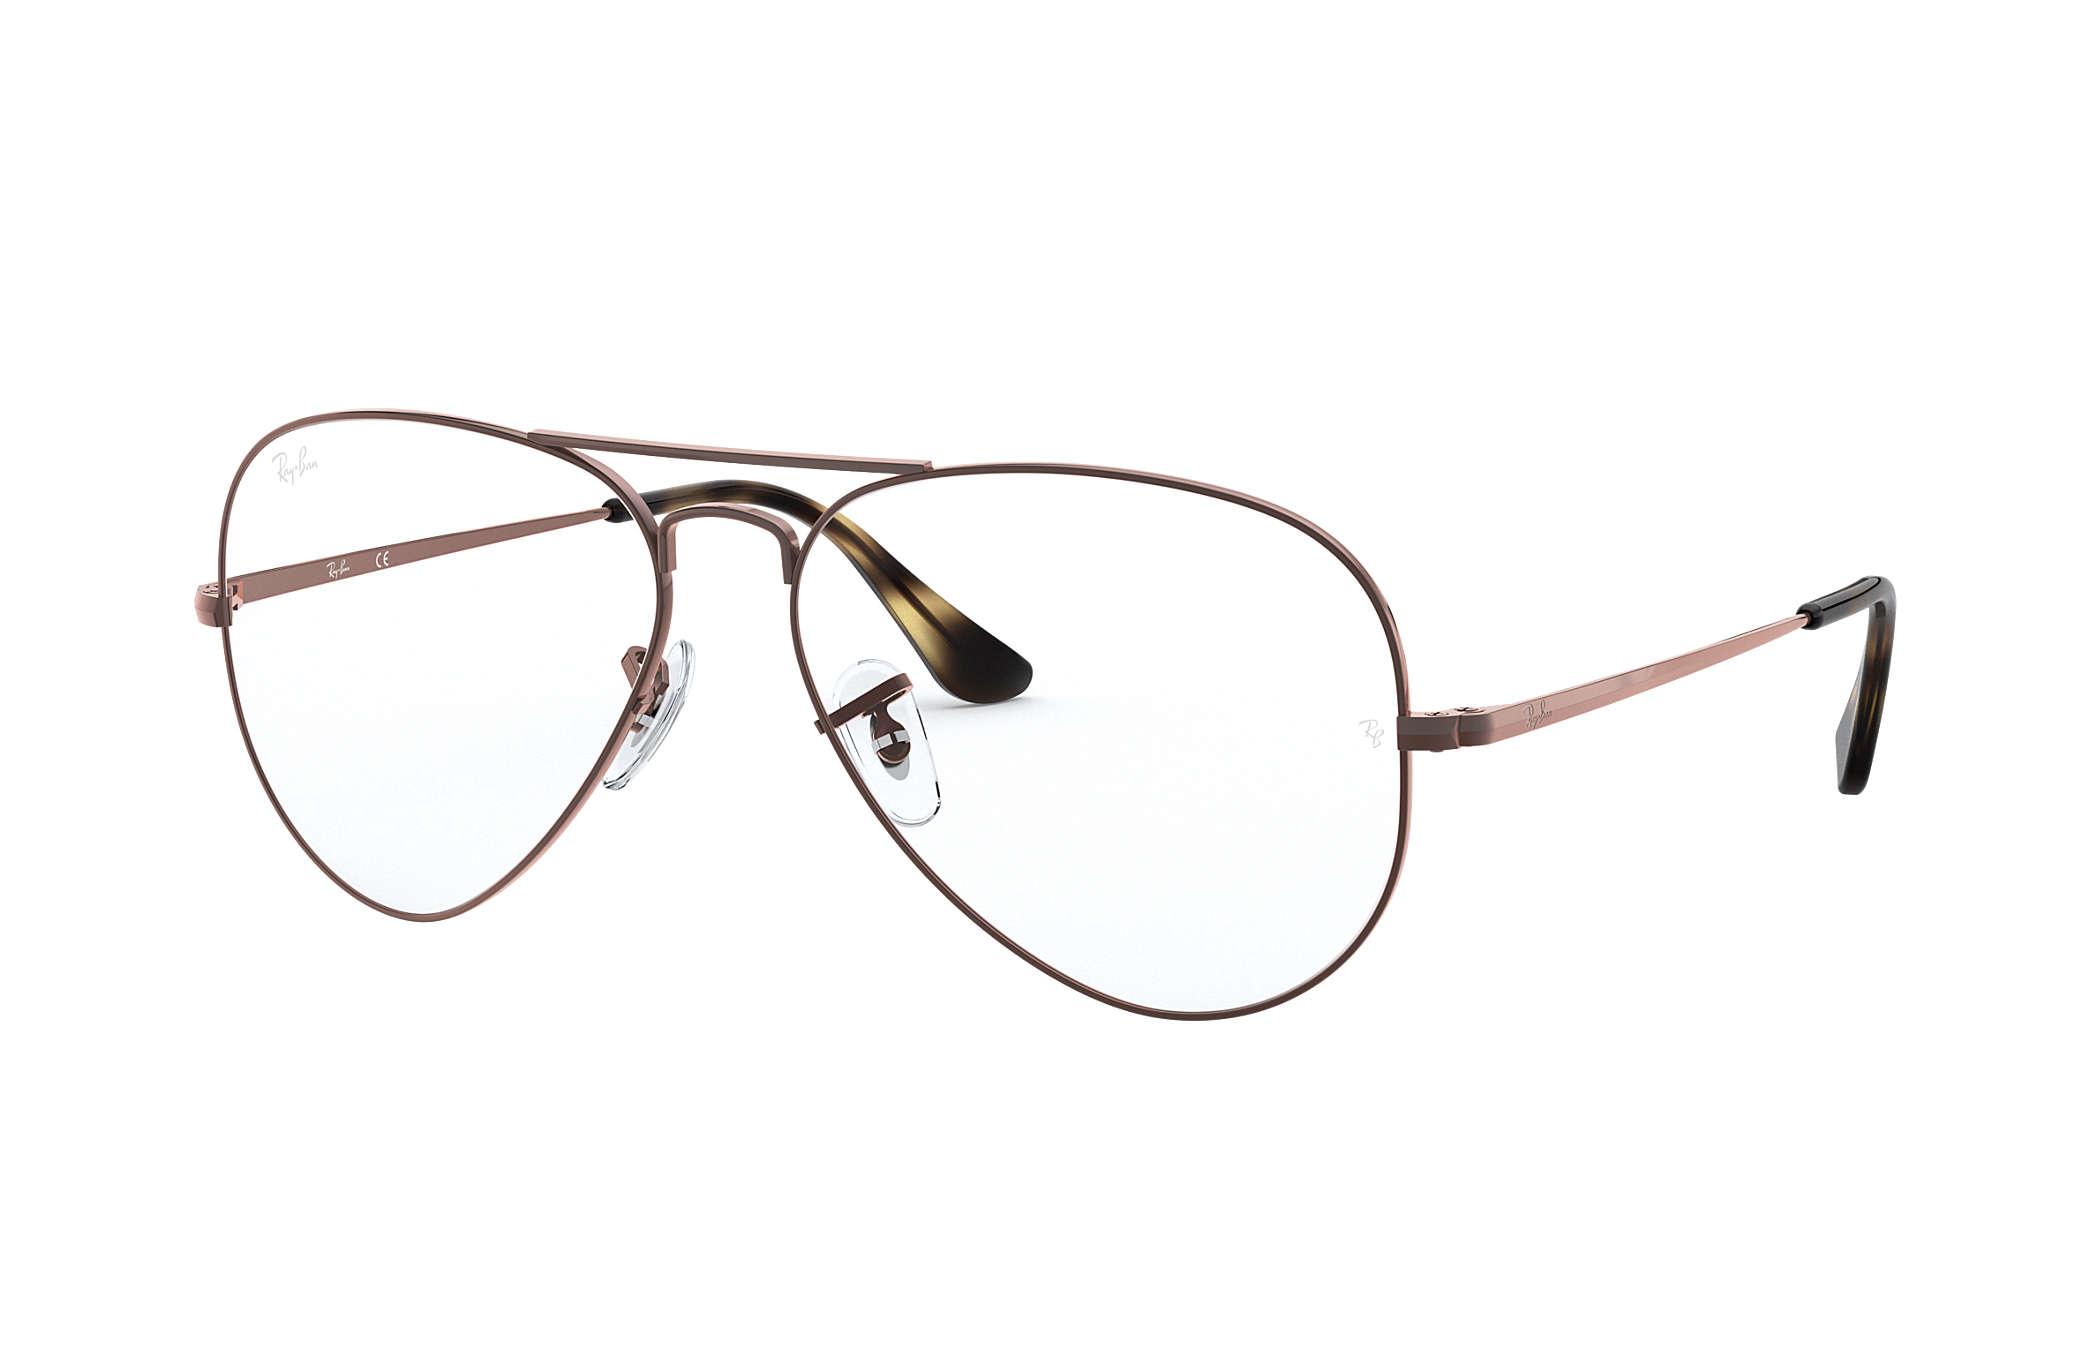 Ray-Ban prescription glasses Aviator Optics RB6489 Light Brown ...